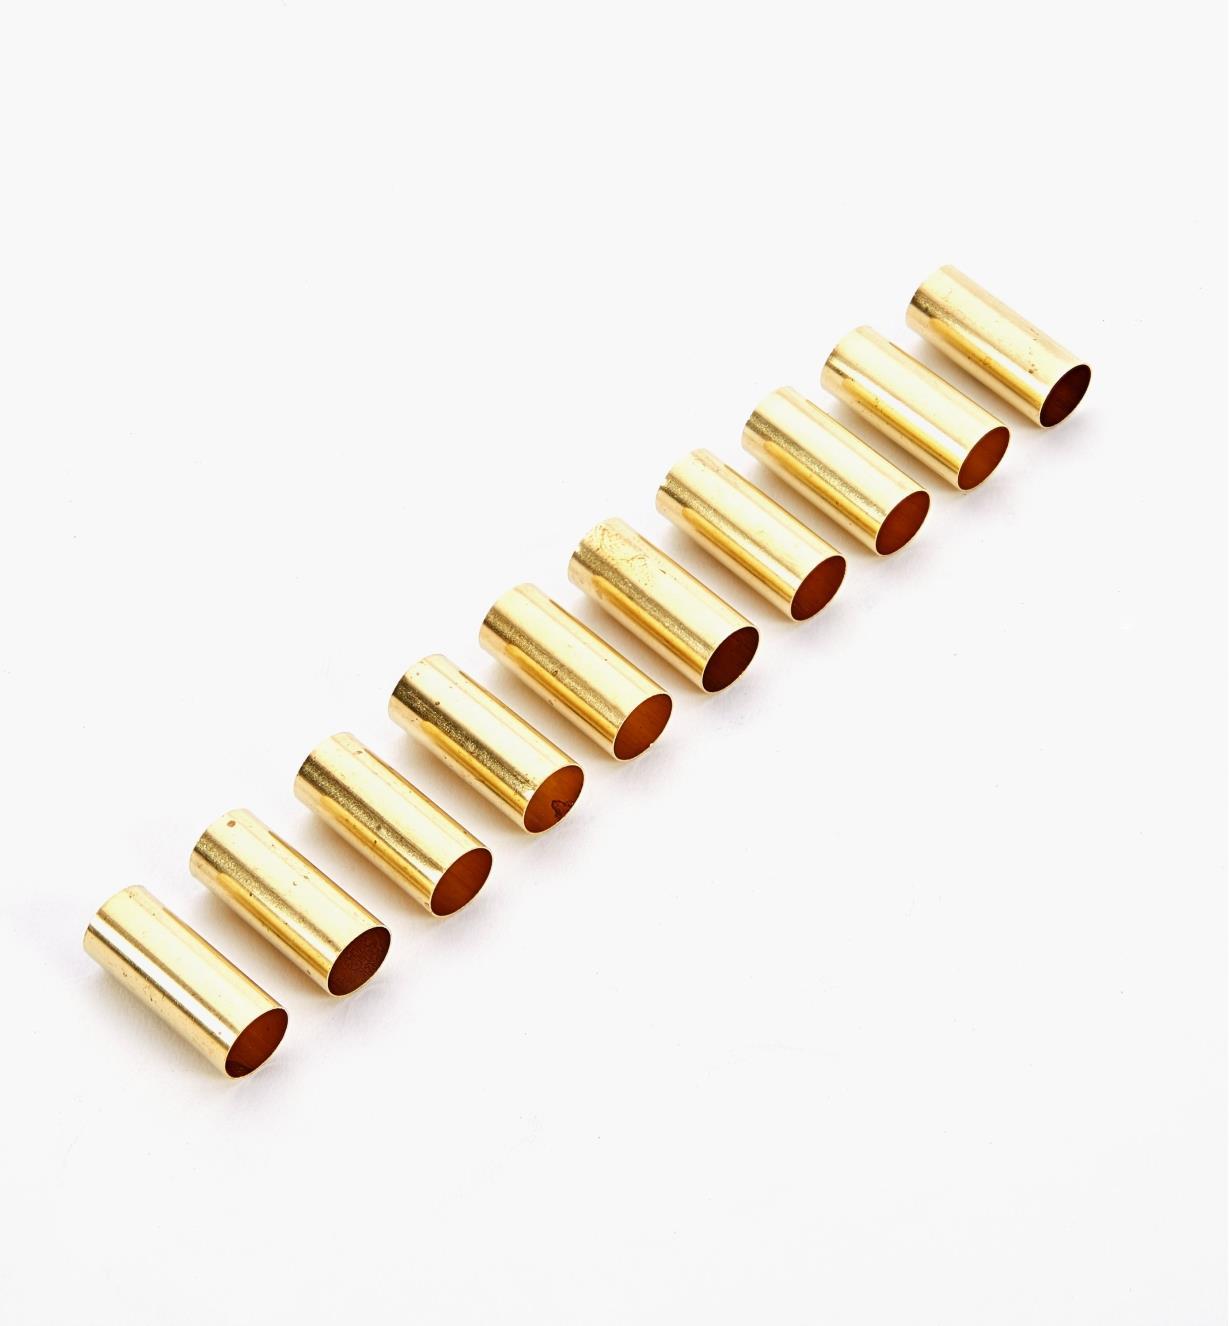 88K8362 - Pensar Ballpoint Replacement Tubes (for 5 pens)